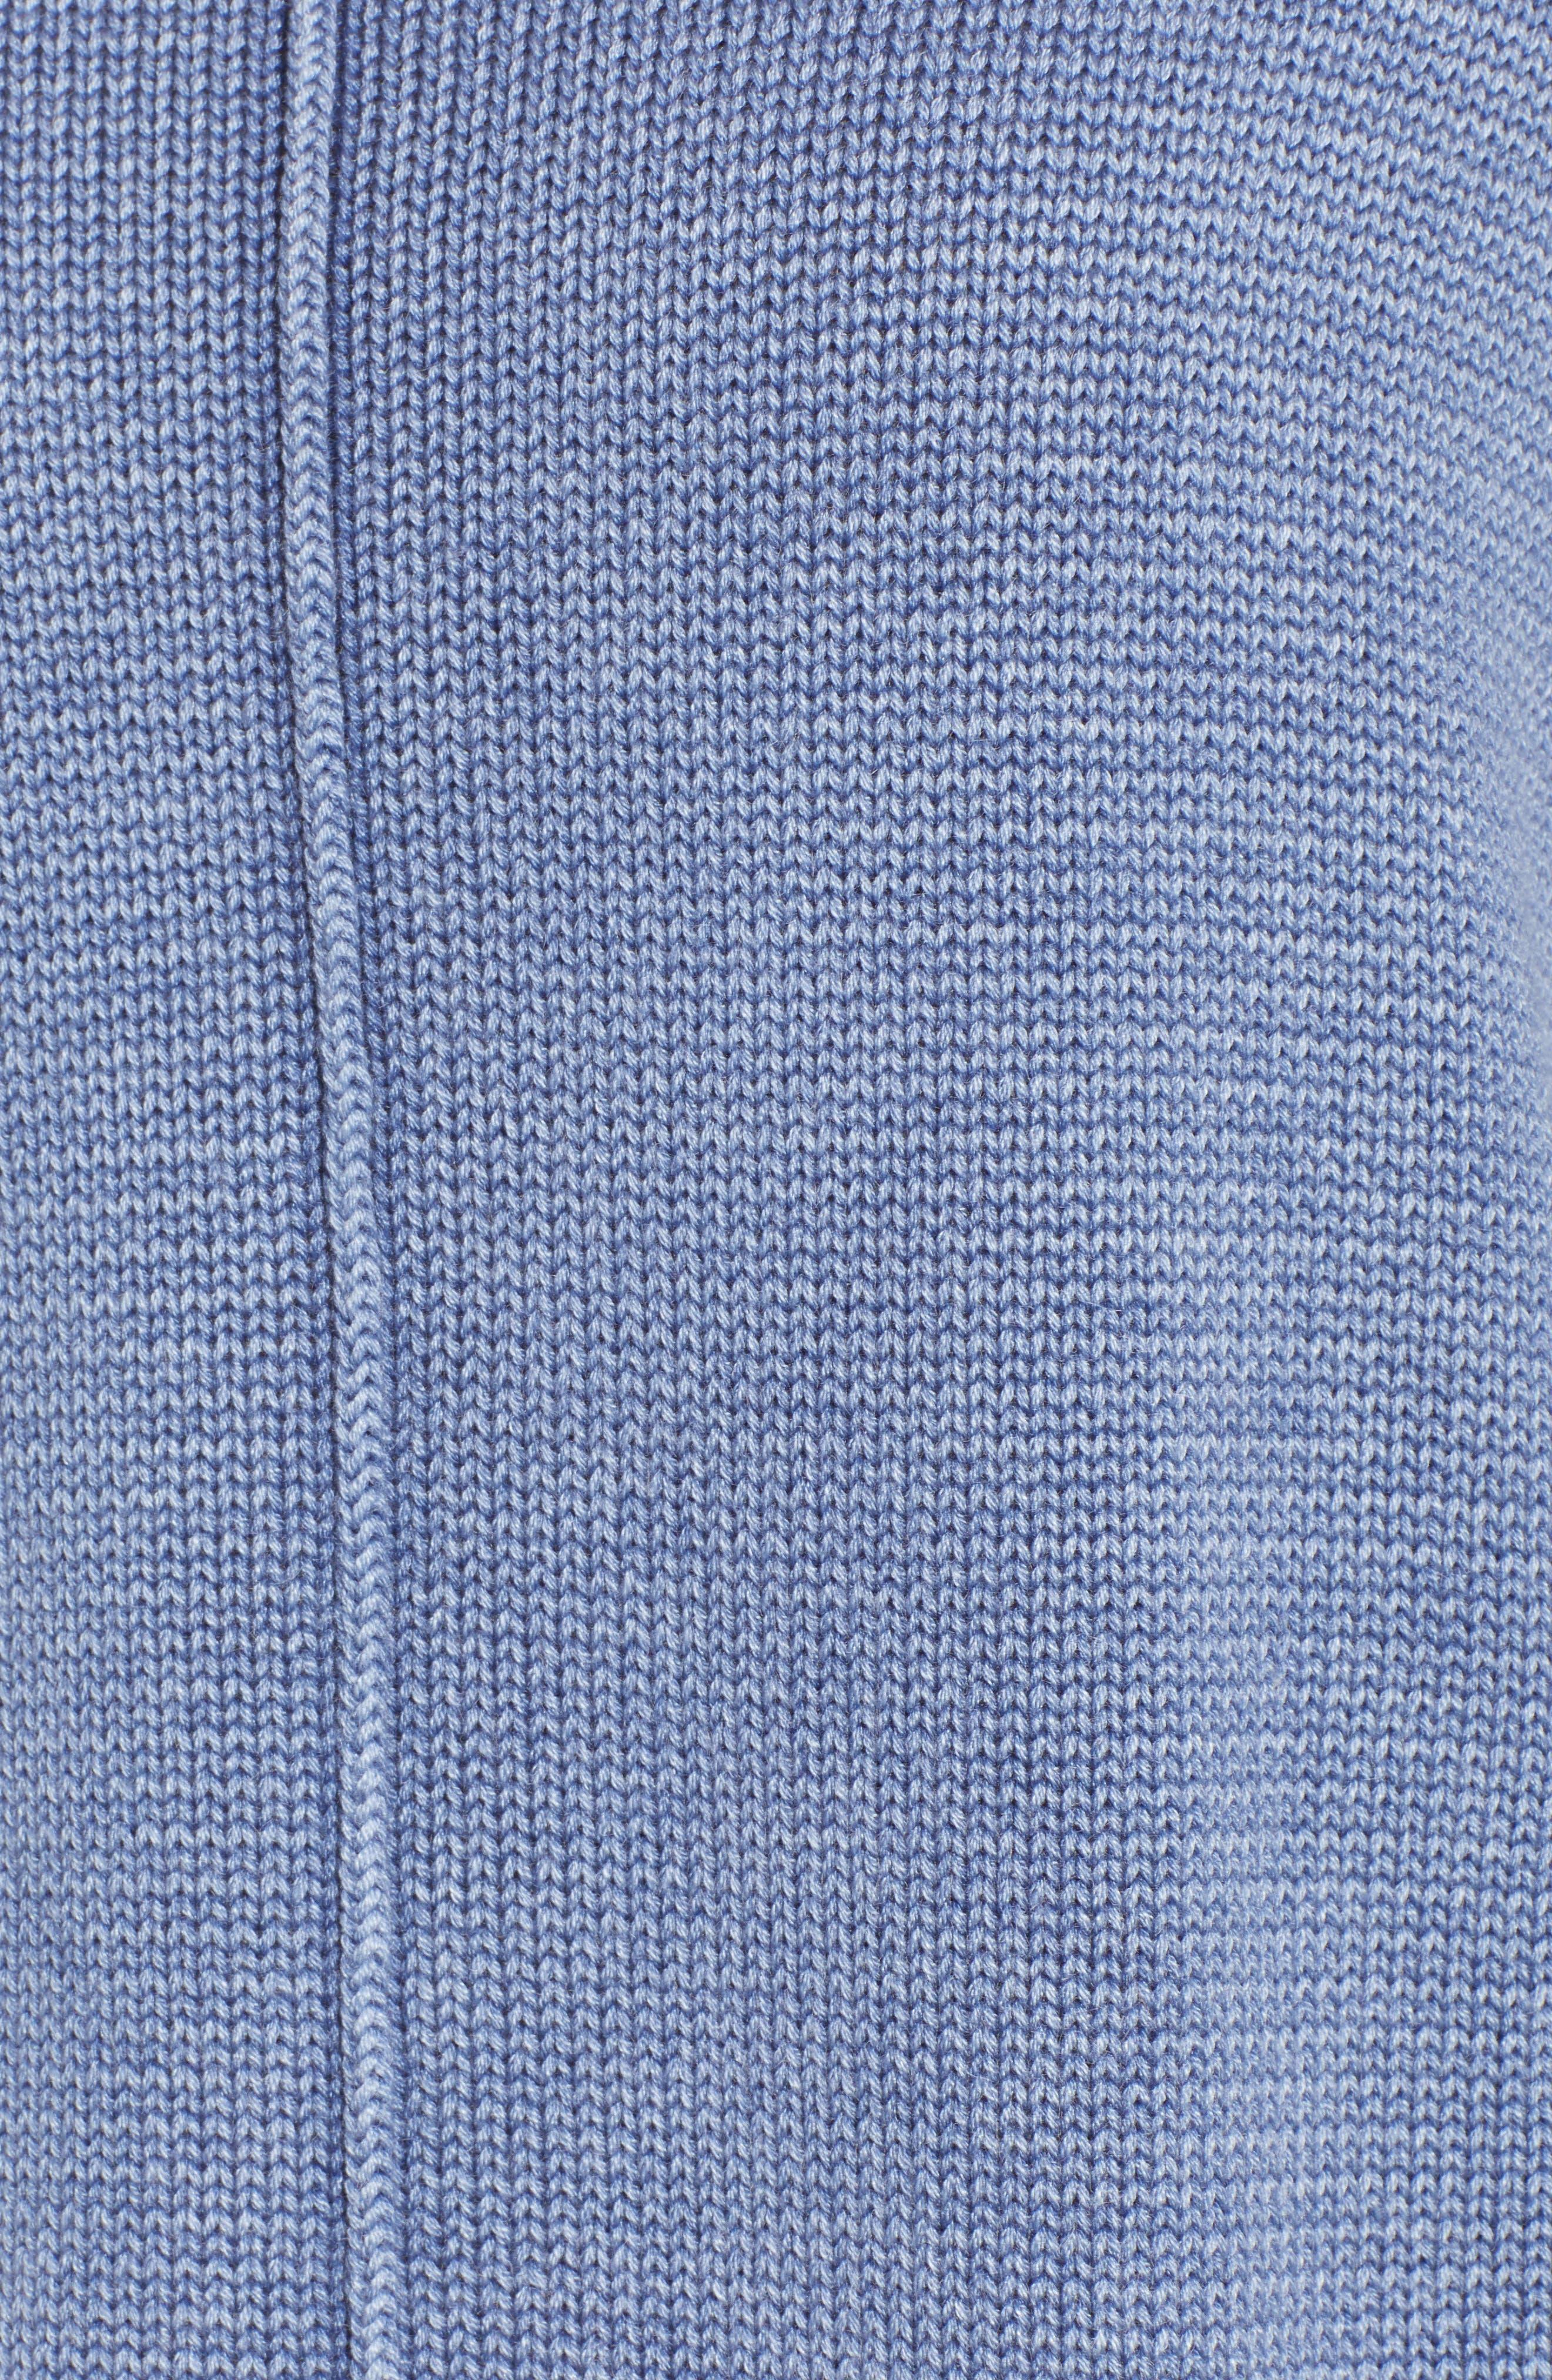 Erin Knit Sweater,                             Alternate thumbnail 6, color,                             Sand Washed Indigo